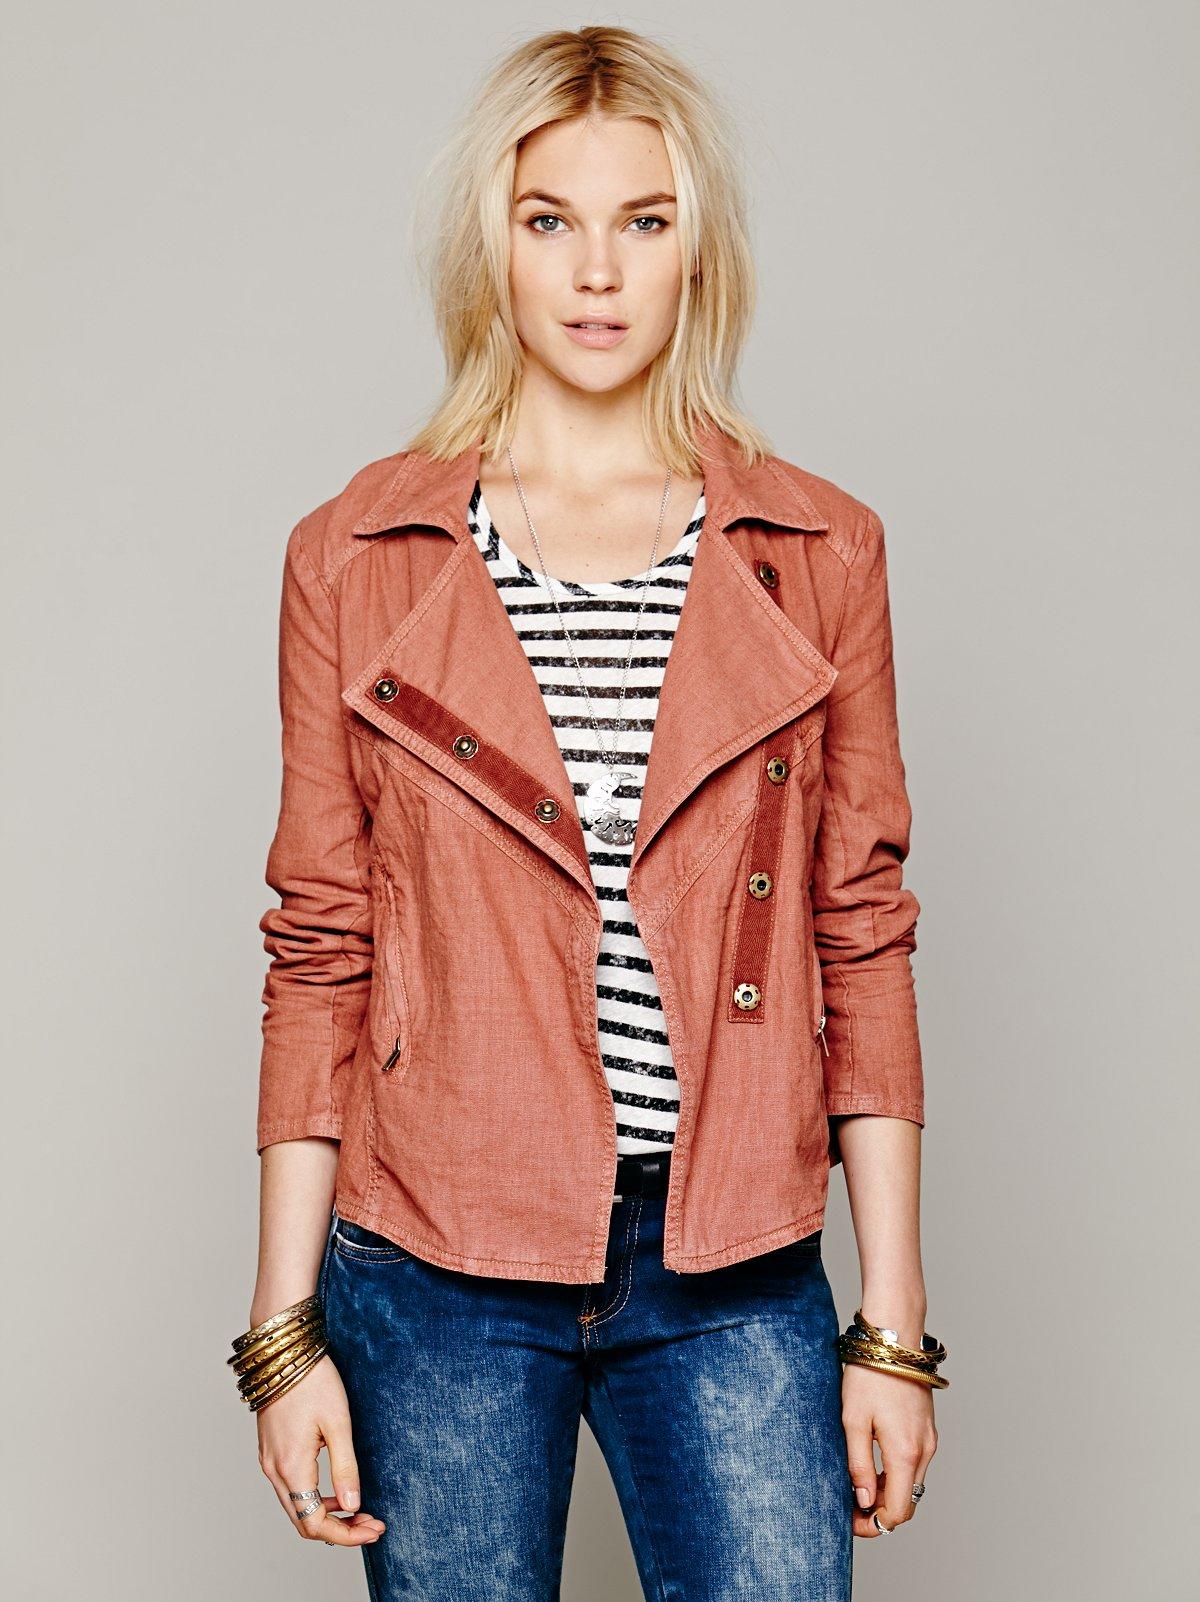 Washed Linen Jacket